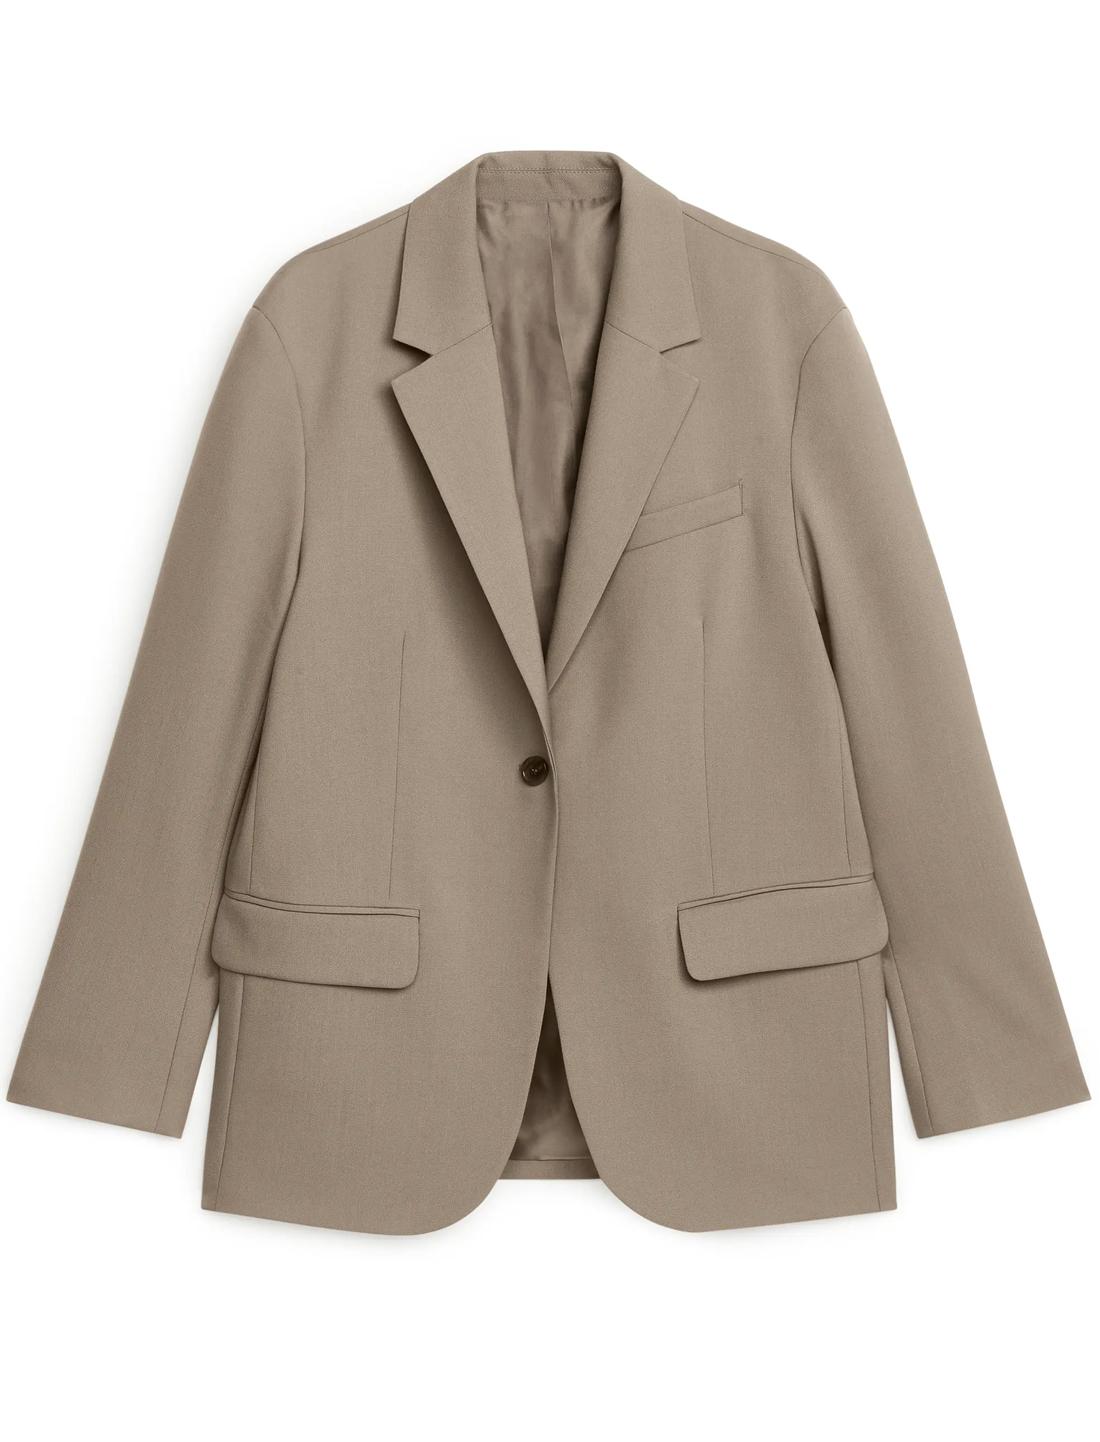 arket oversized blazer